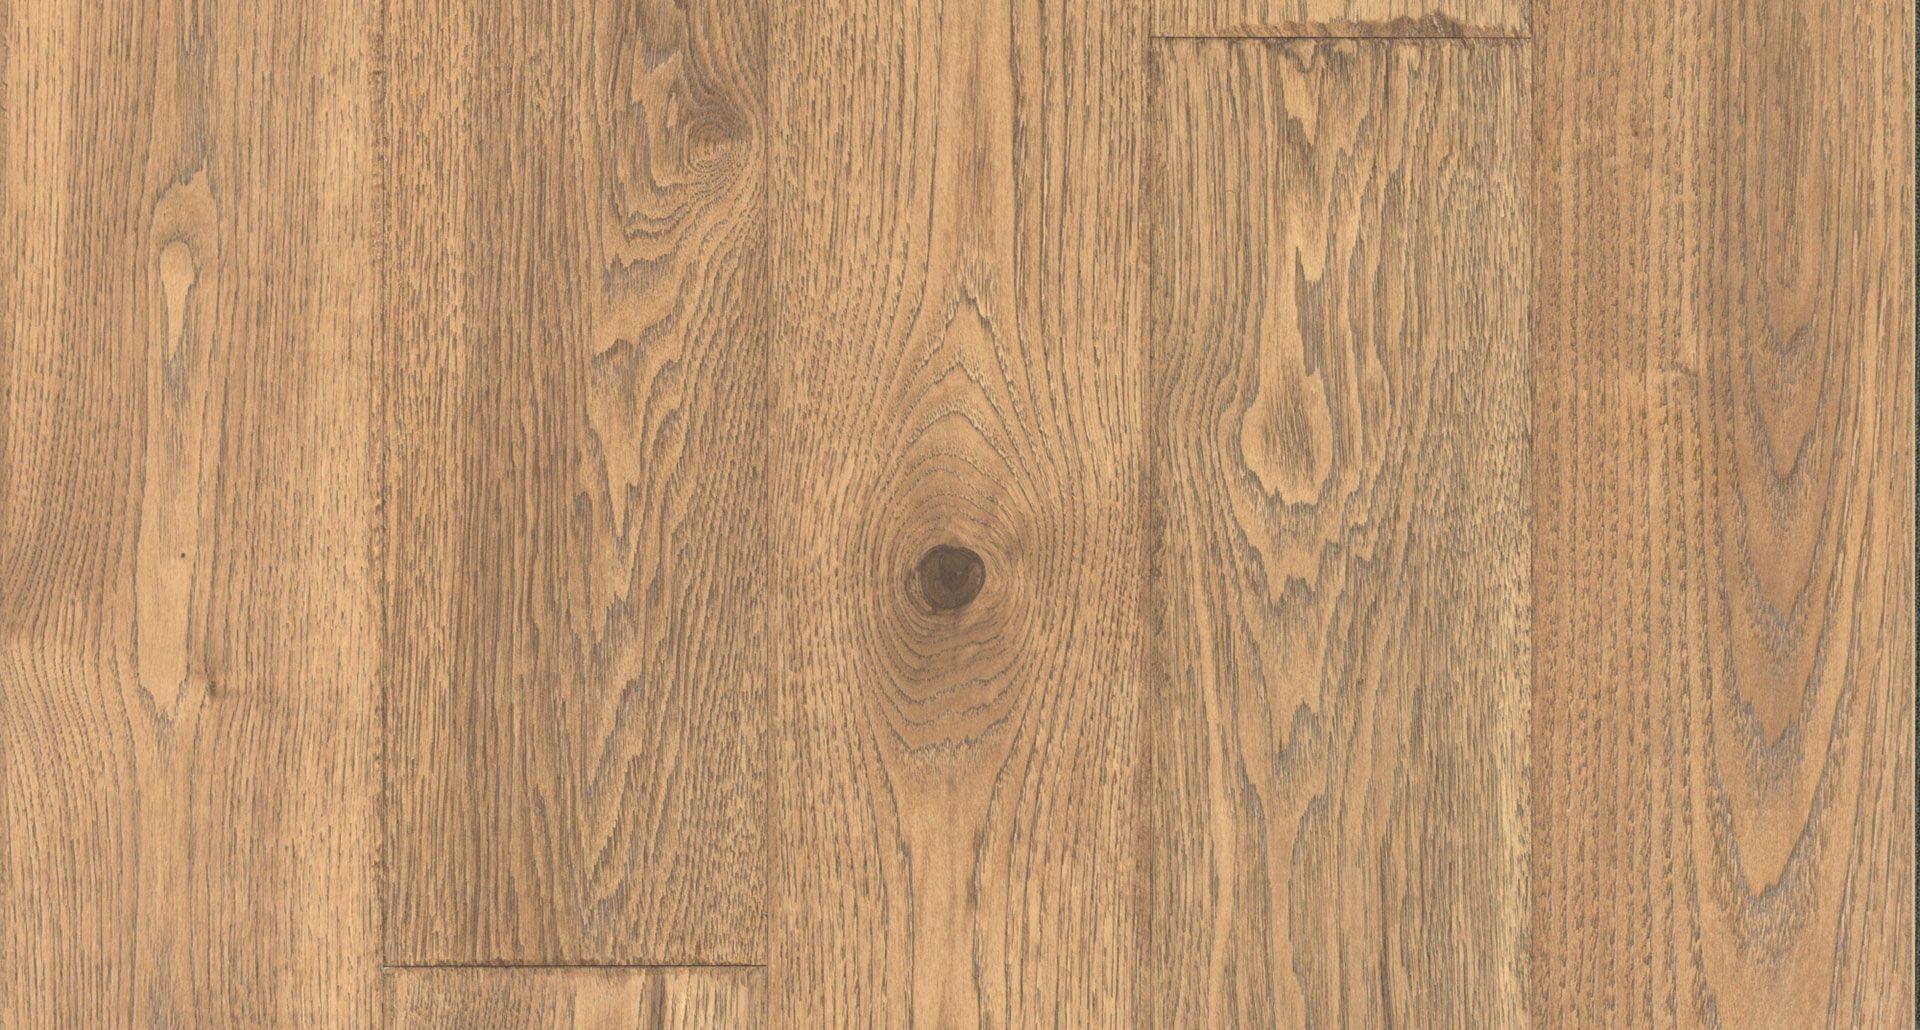 bruce hickory hardwood flooring of bruce hardwood floor plan ideas for brier creek oak laminate floor natural wood look 12mm thick 1